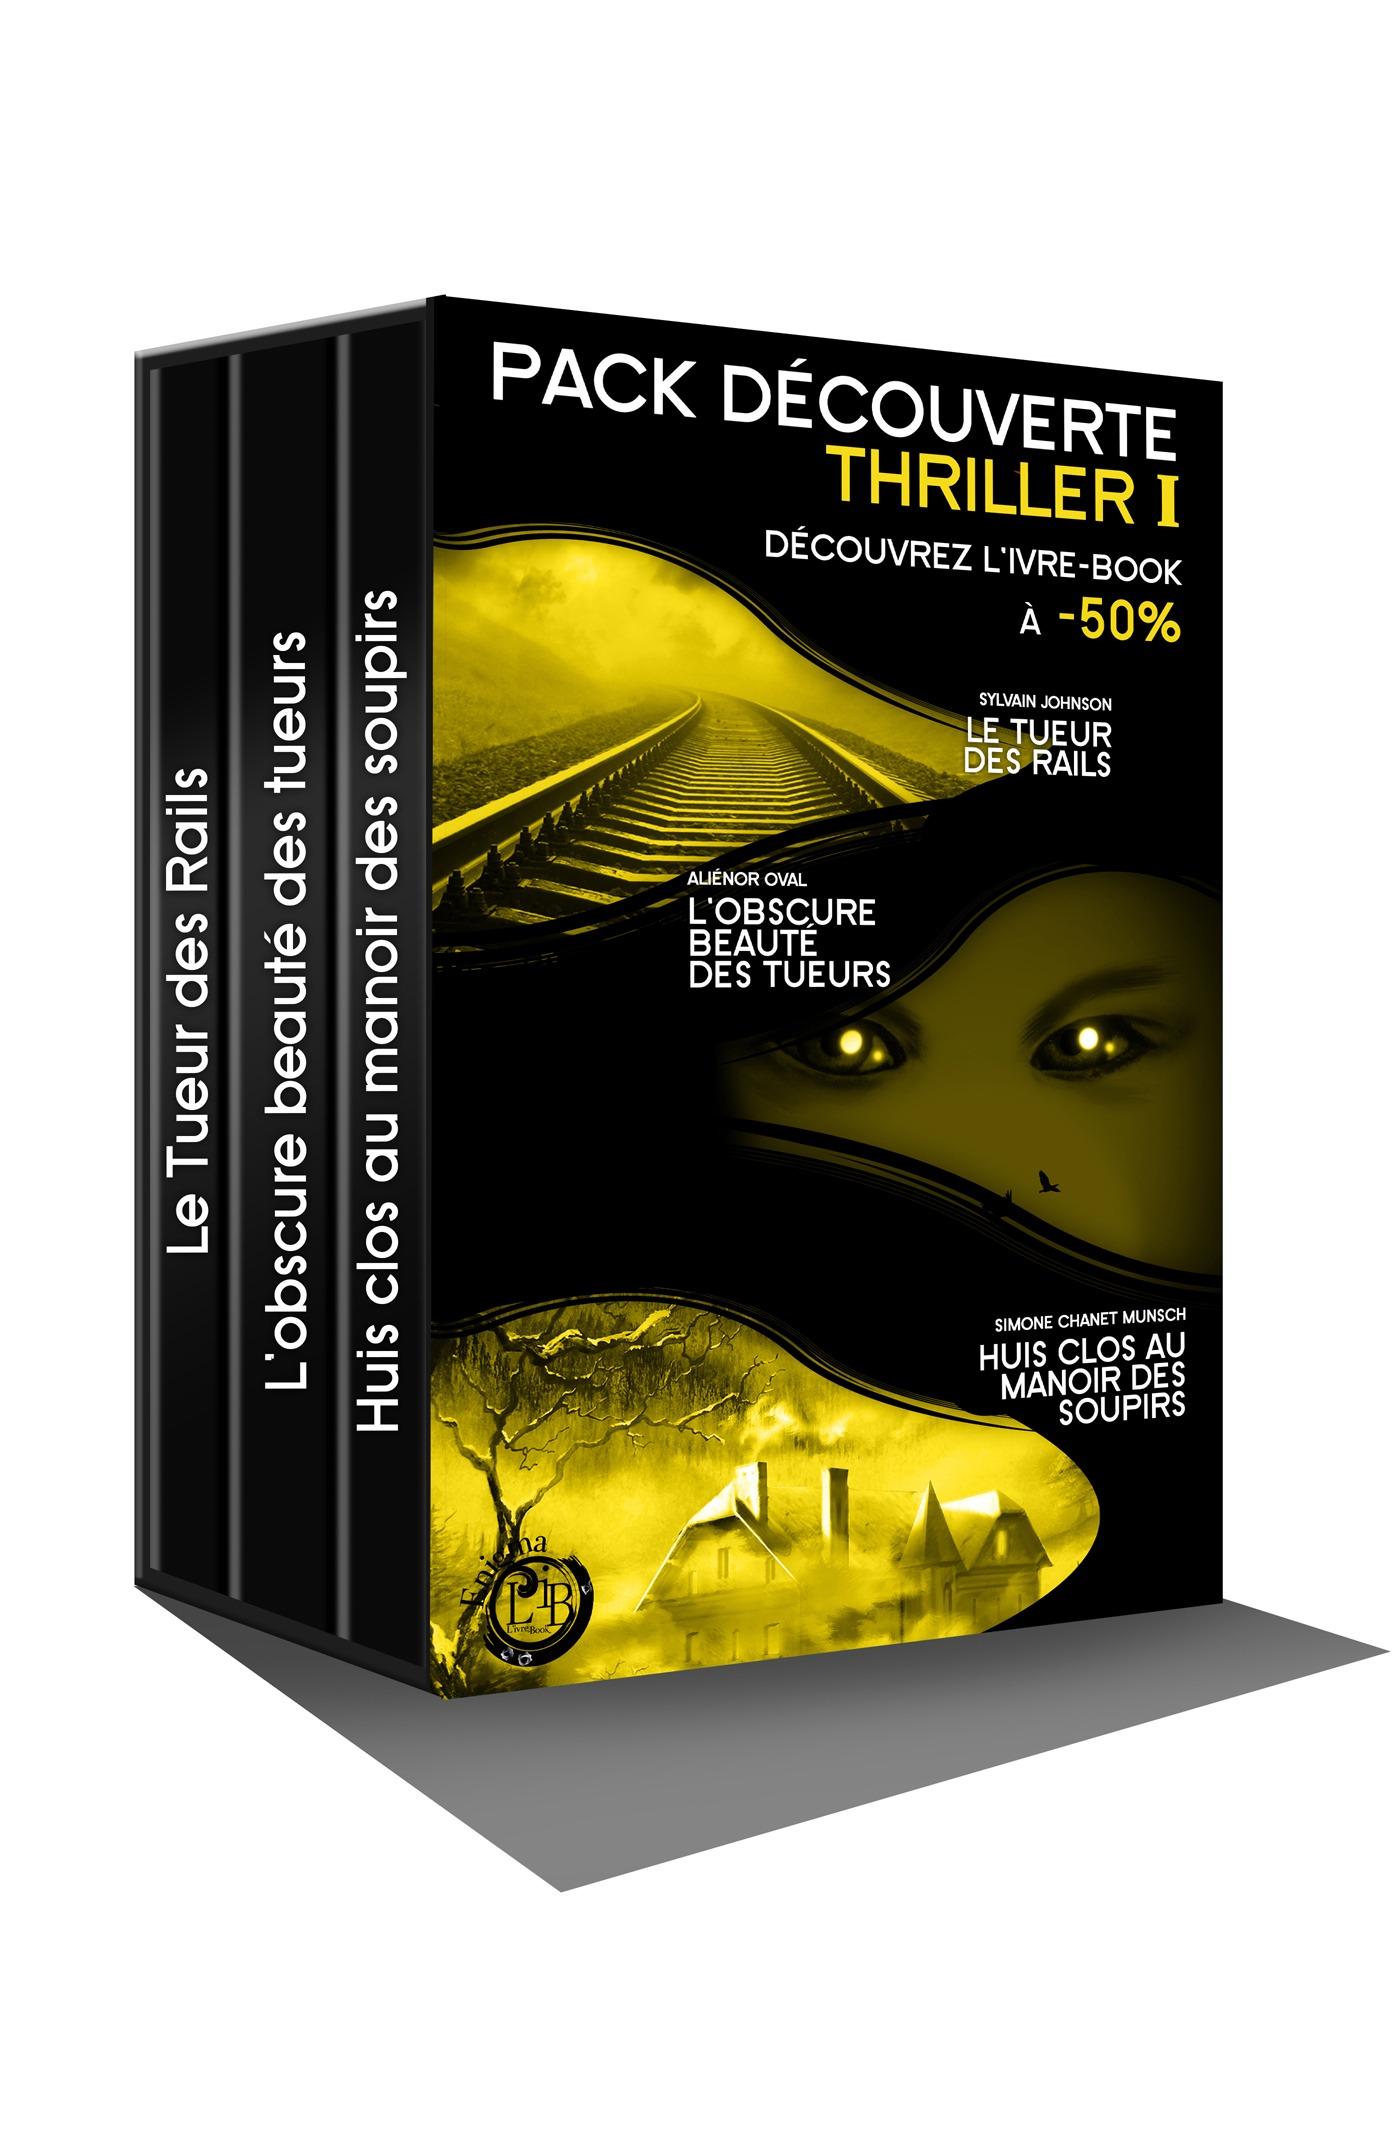 Pack Découverte Thriller 1